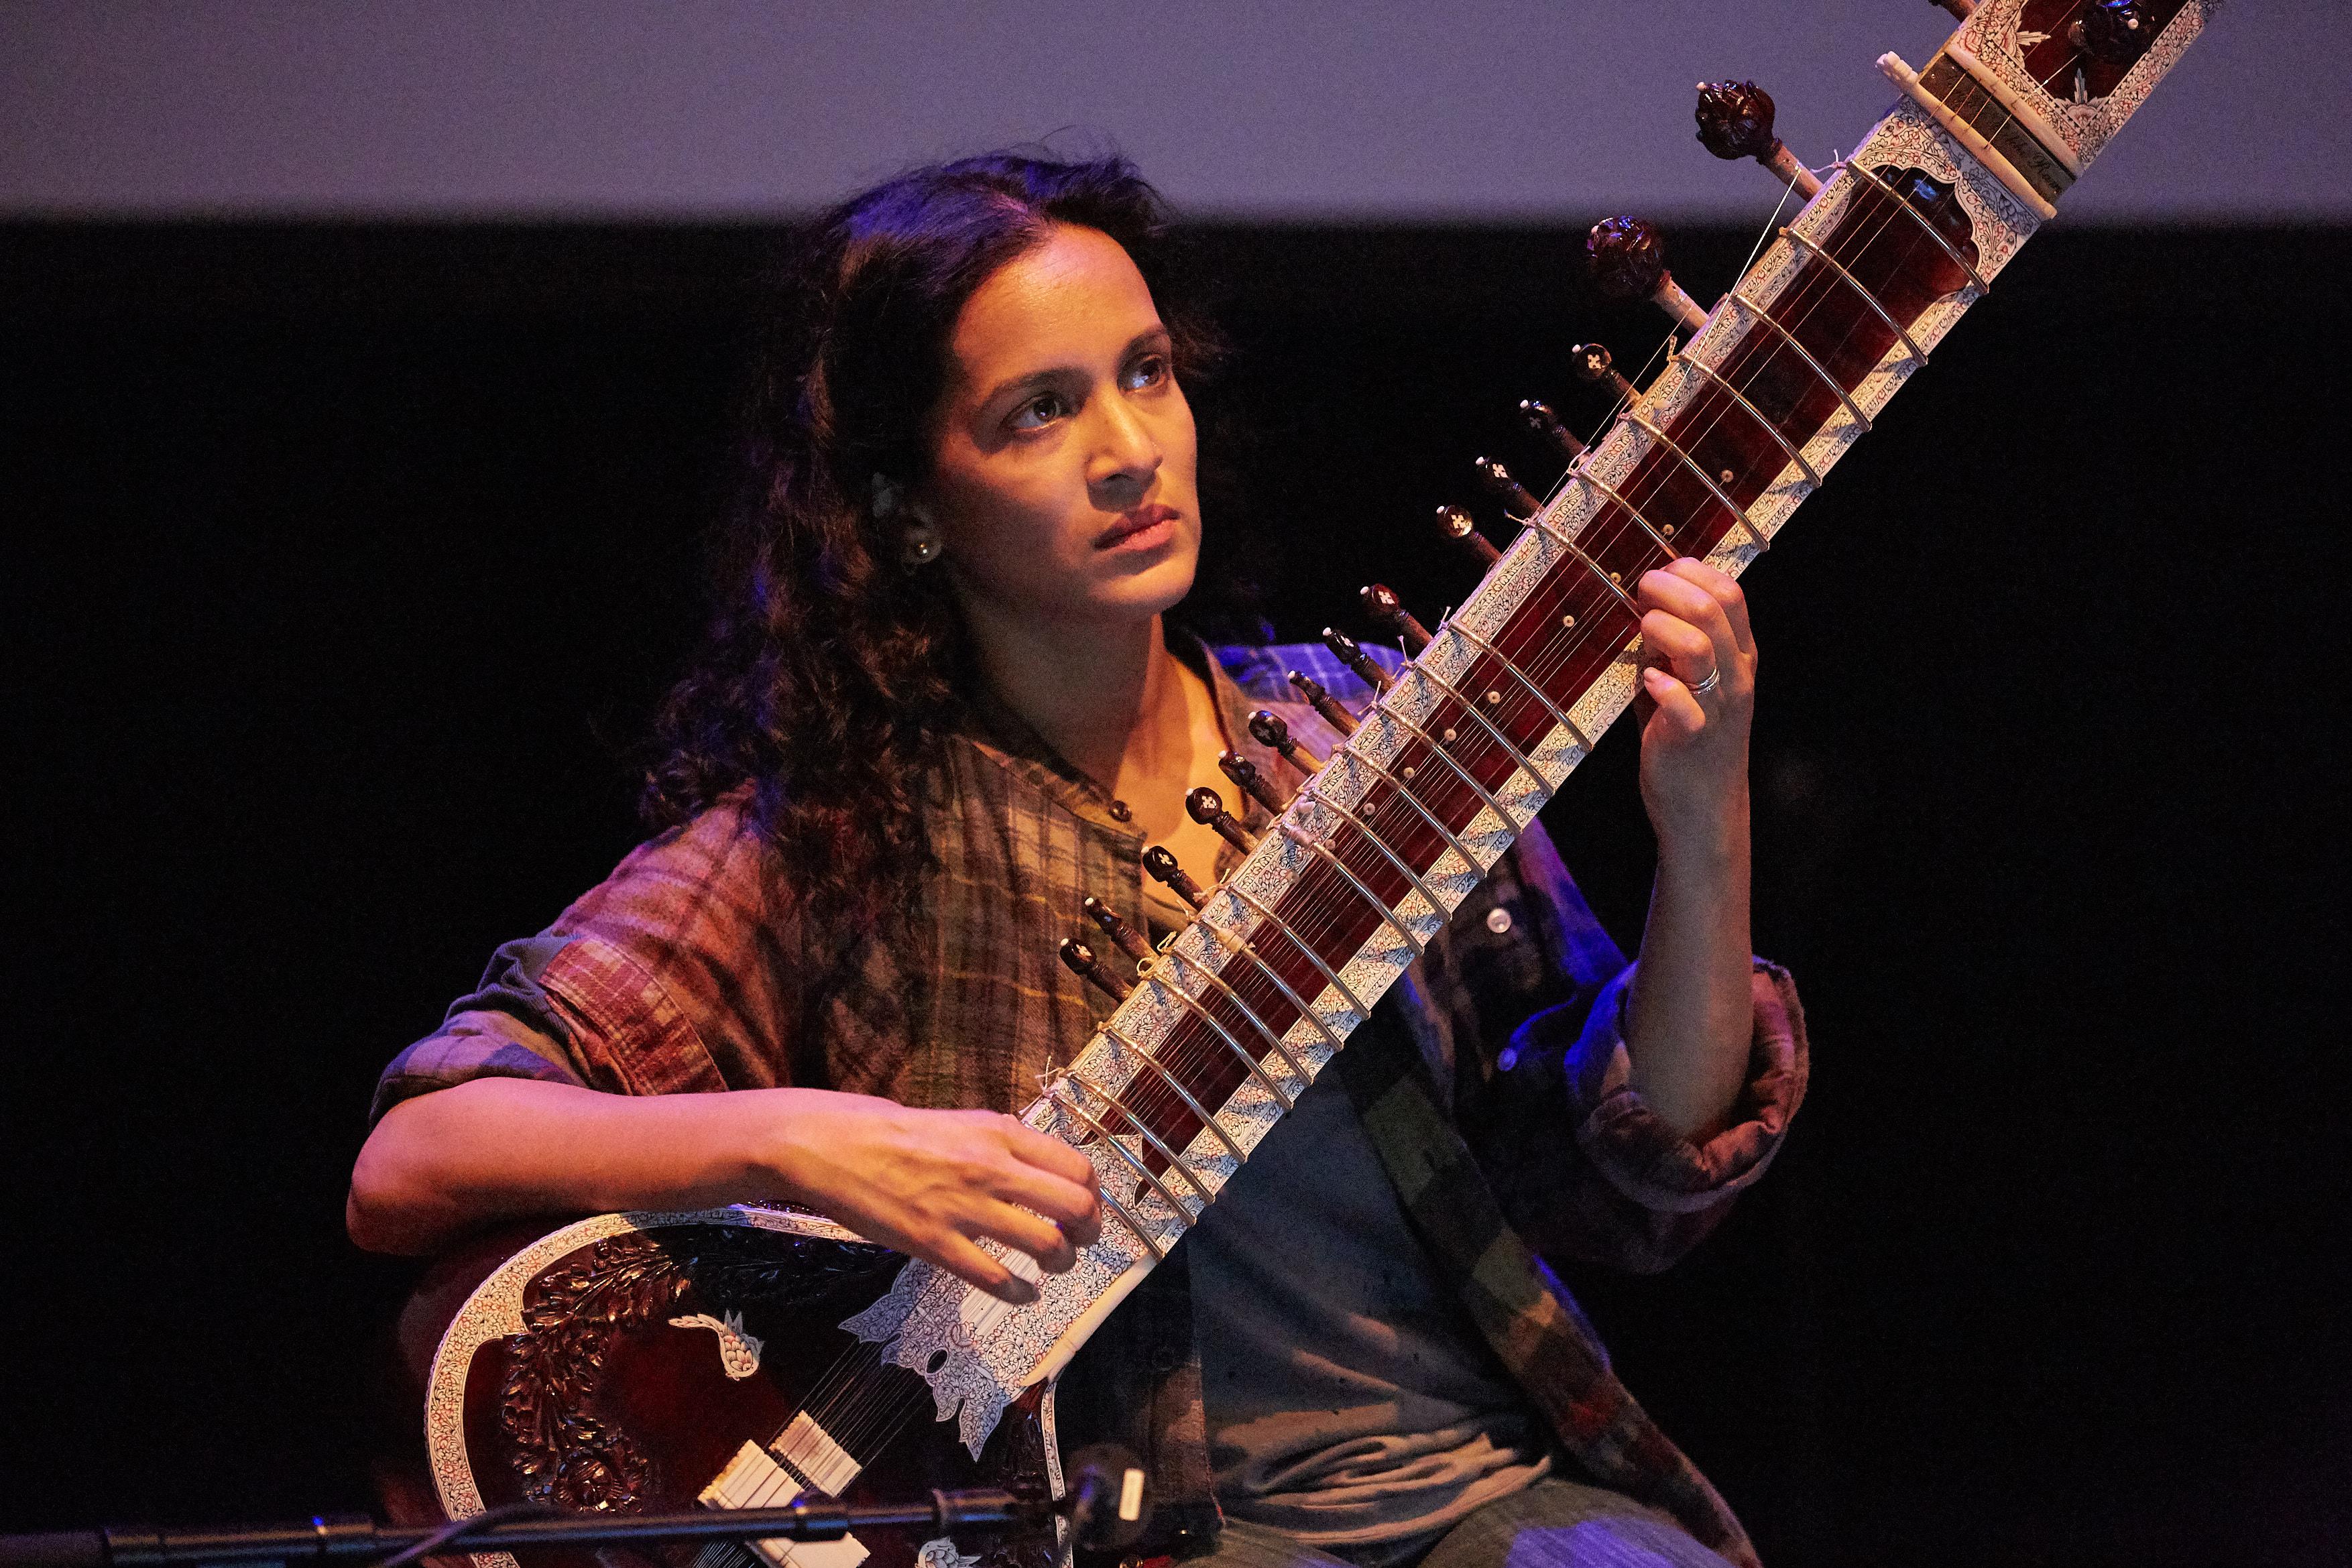 Anoushka Shankar accompanies Shiraz: A Romance of India at the BFI London Film Festival Archive Gala. Credit: Darren Brade Photography